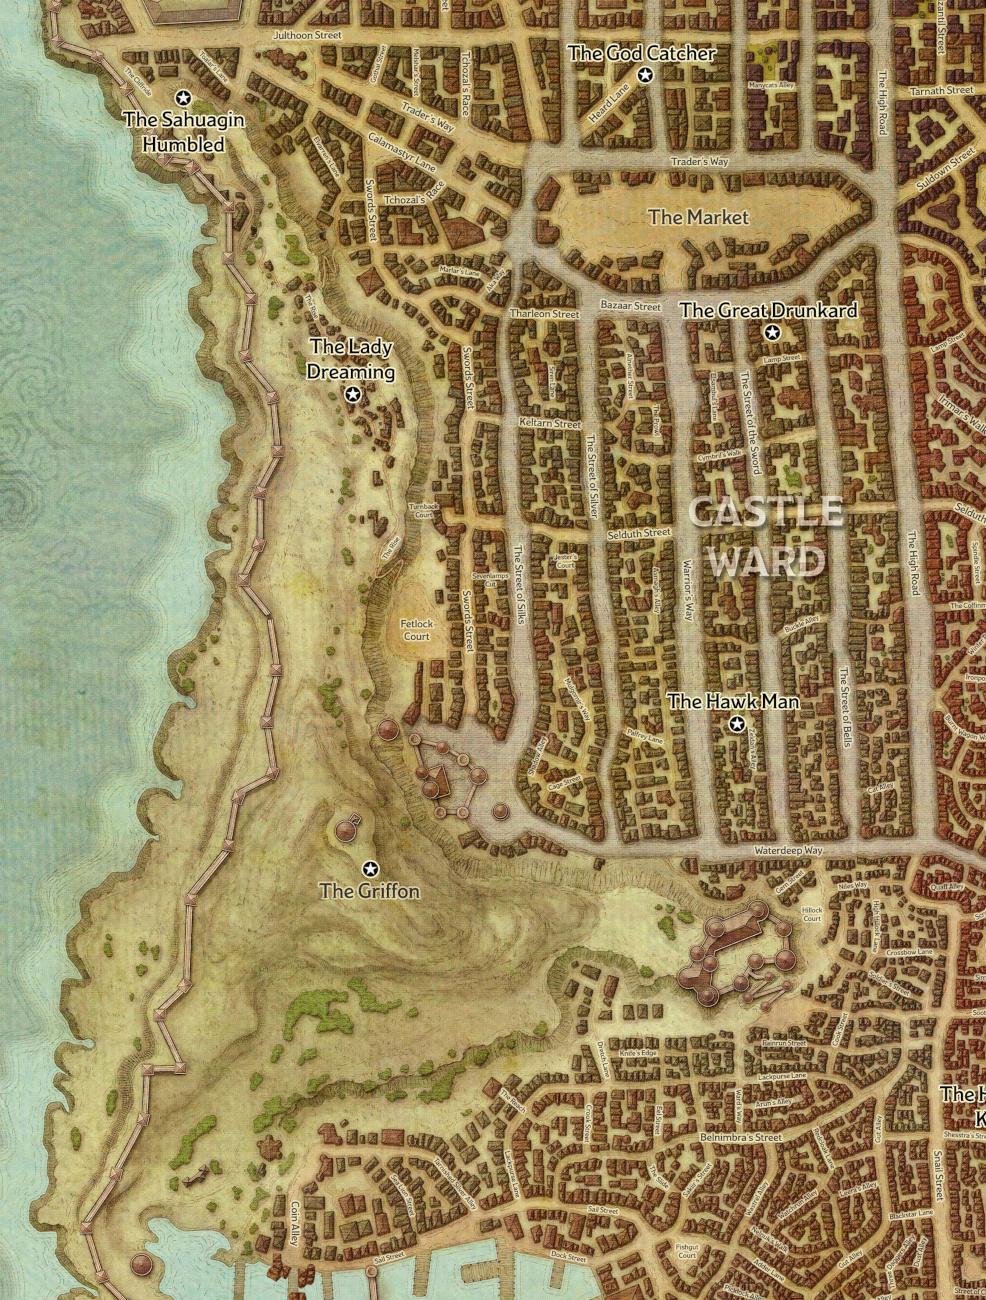 Waterdeep/Castle Ward/Imagemap